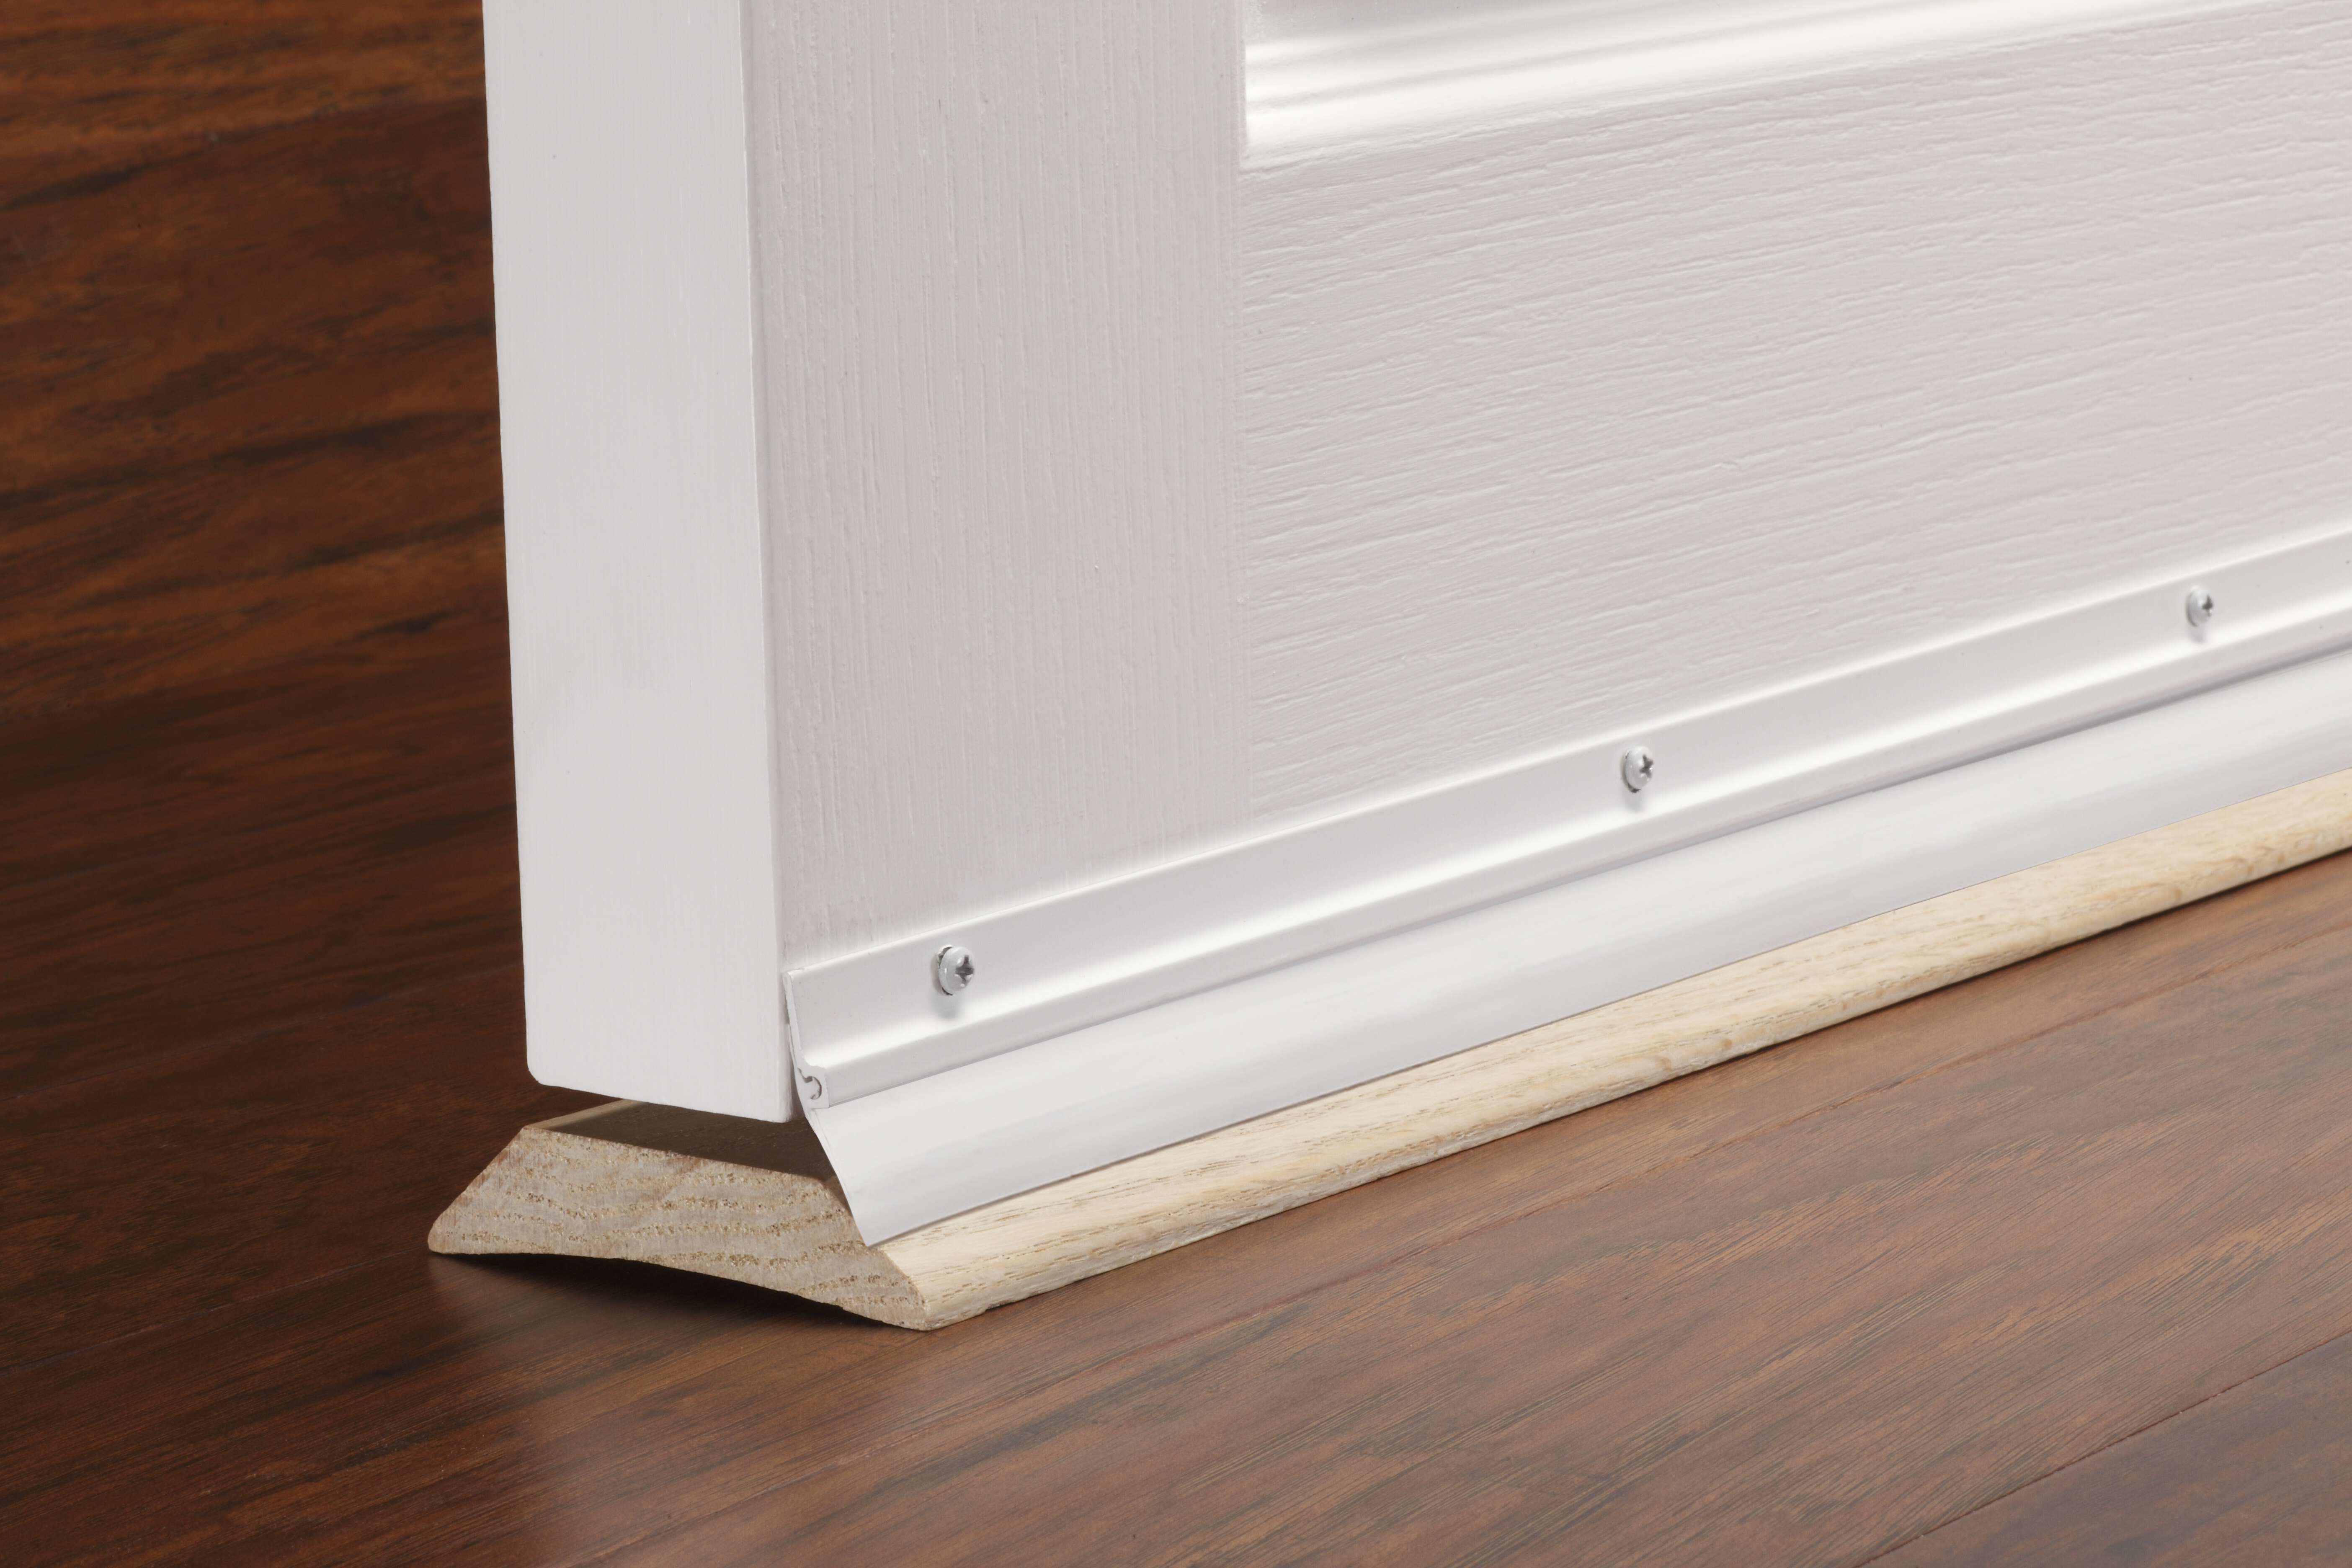 M D Standard Door Sweep Aluminum Vinyl 36 White M D Building Products Inc